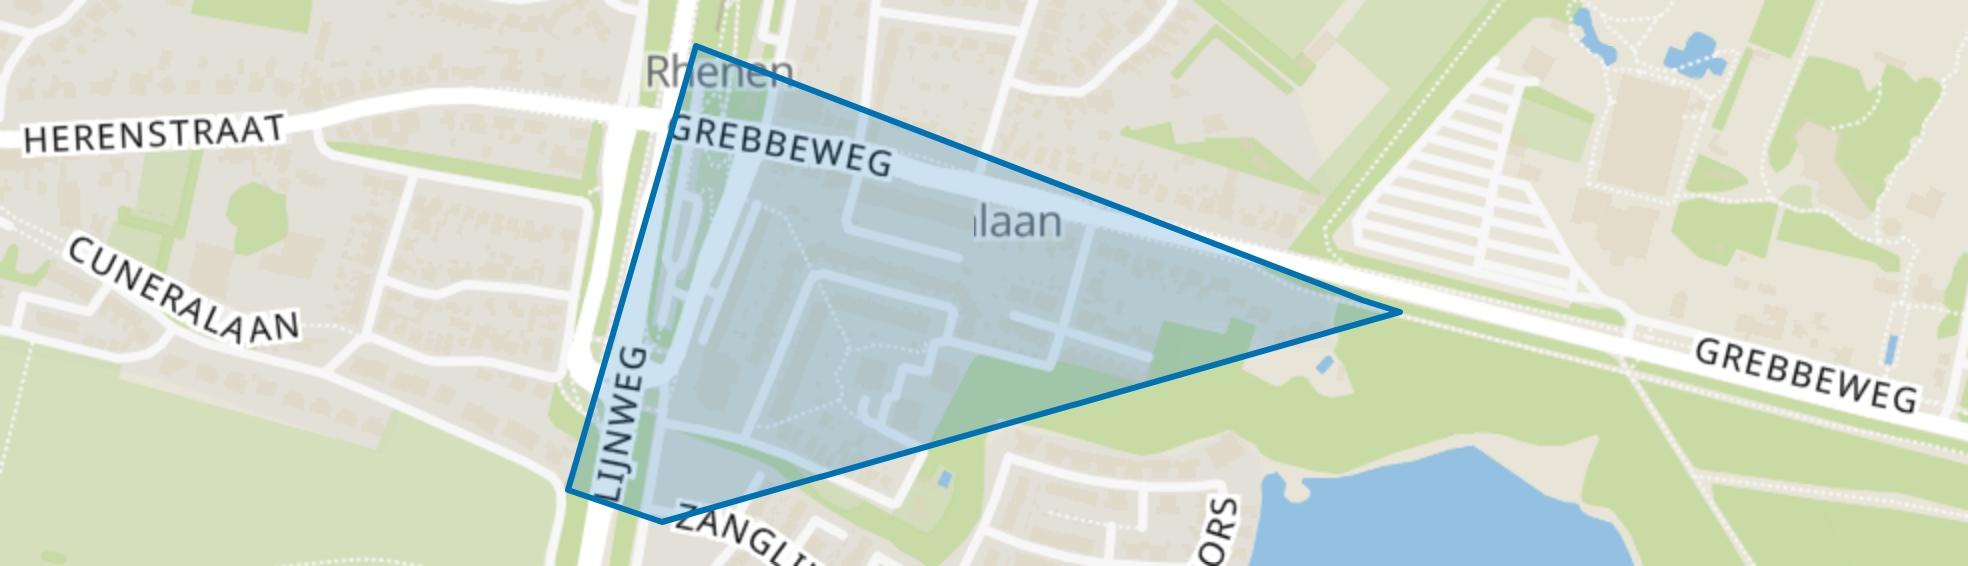 Grebbekwartier Zuid, Rhenen map